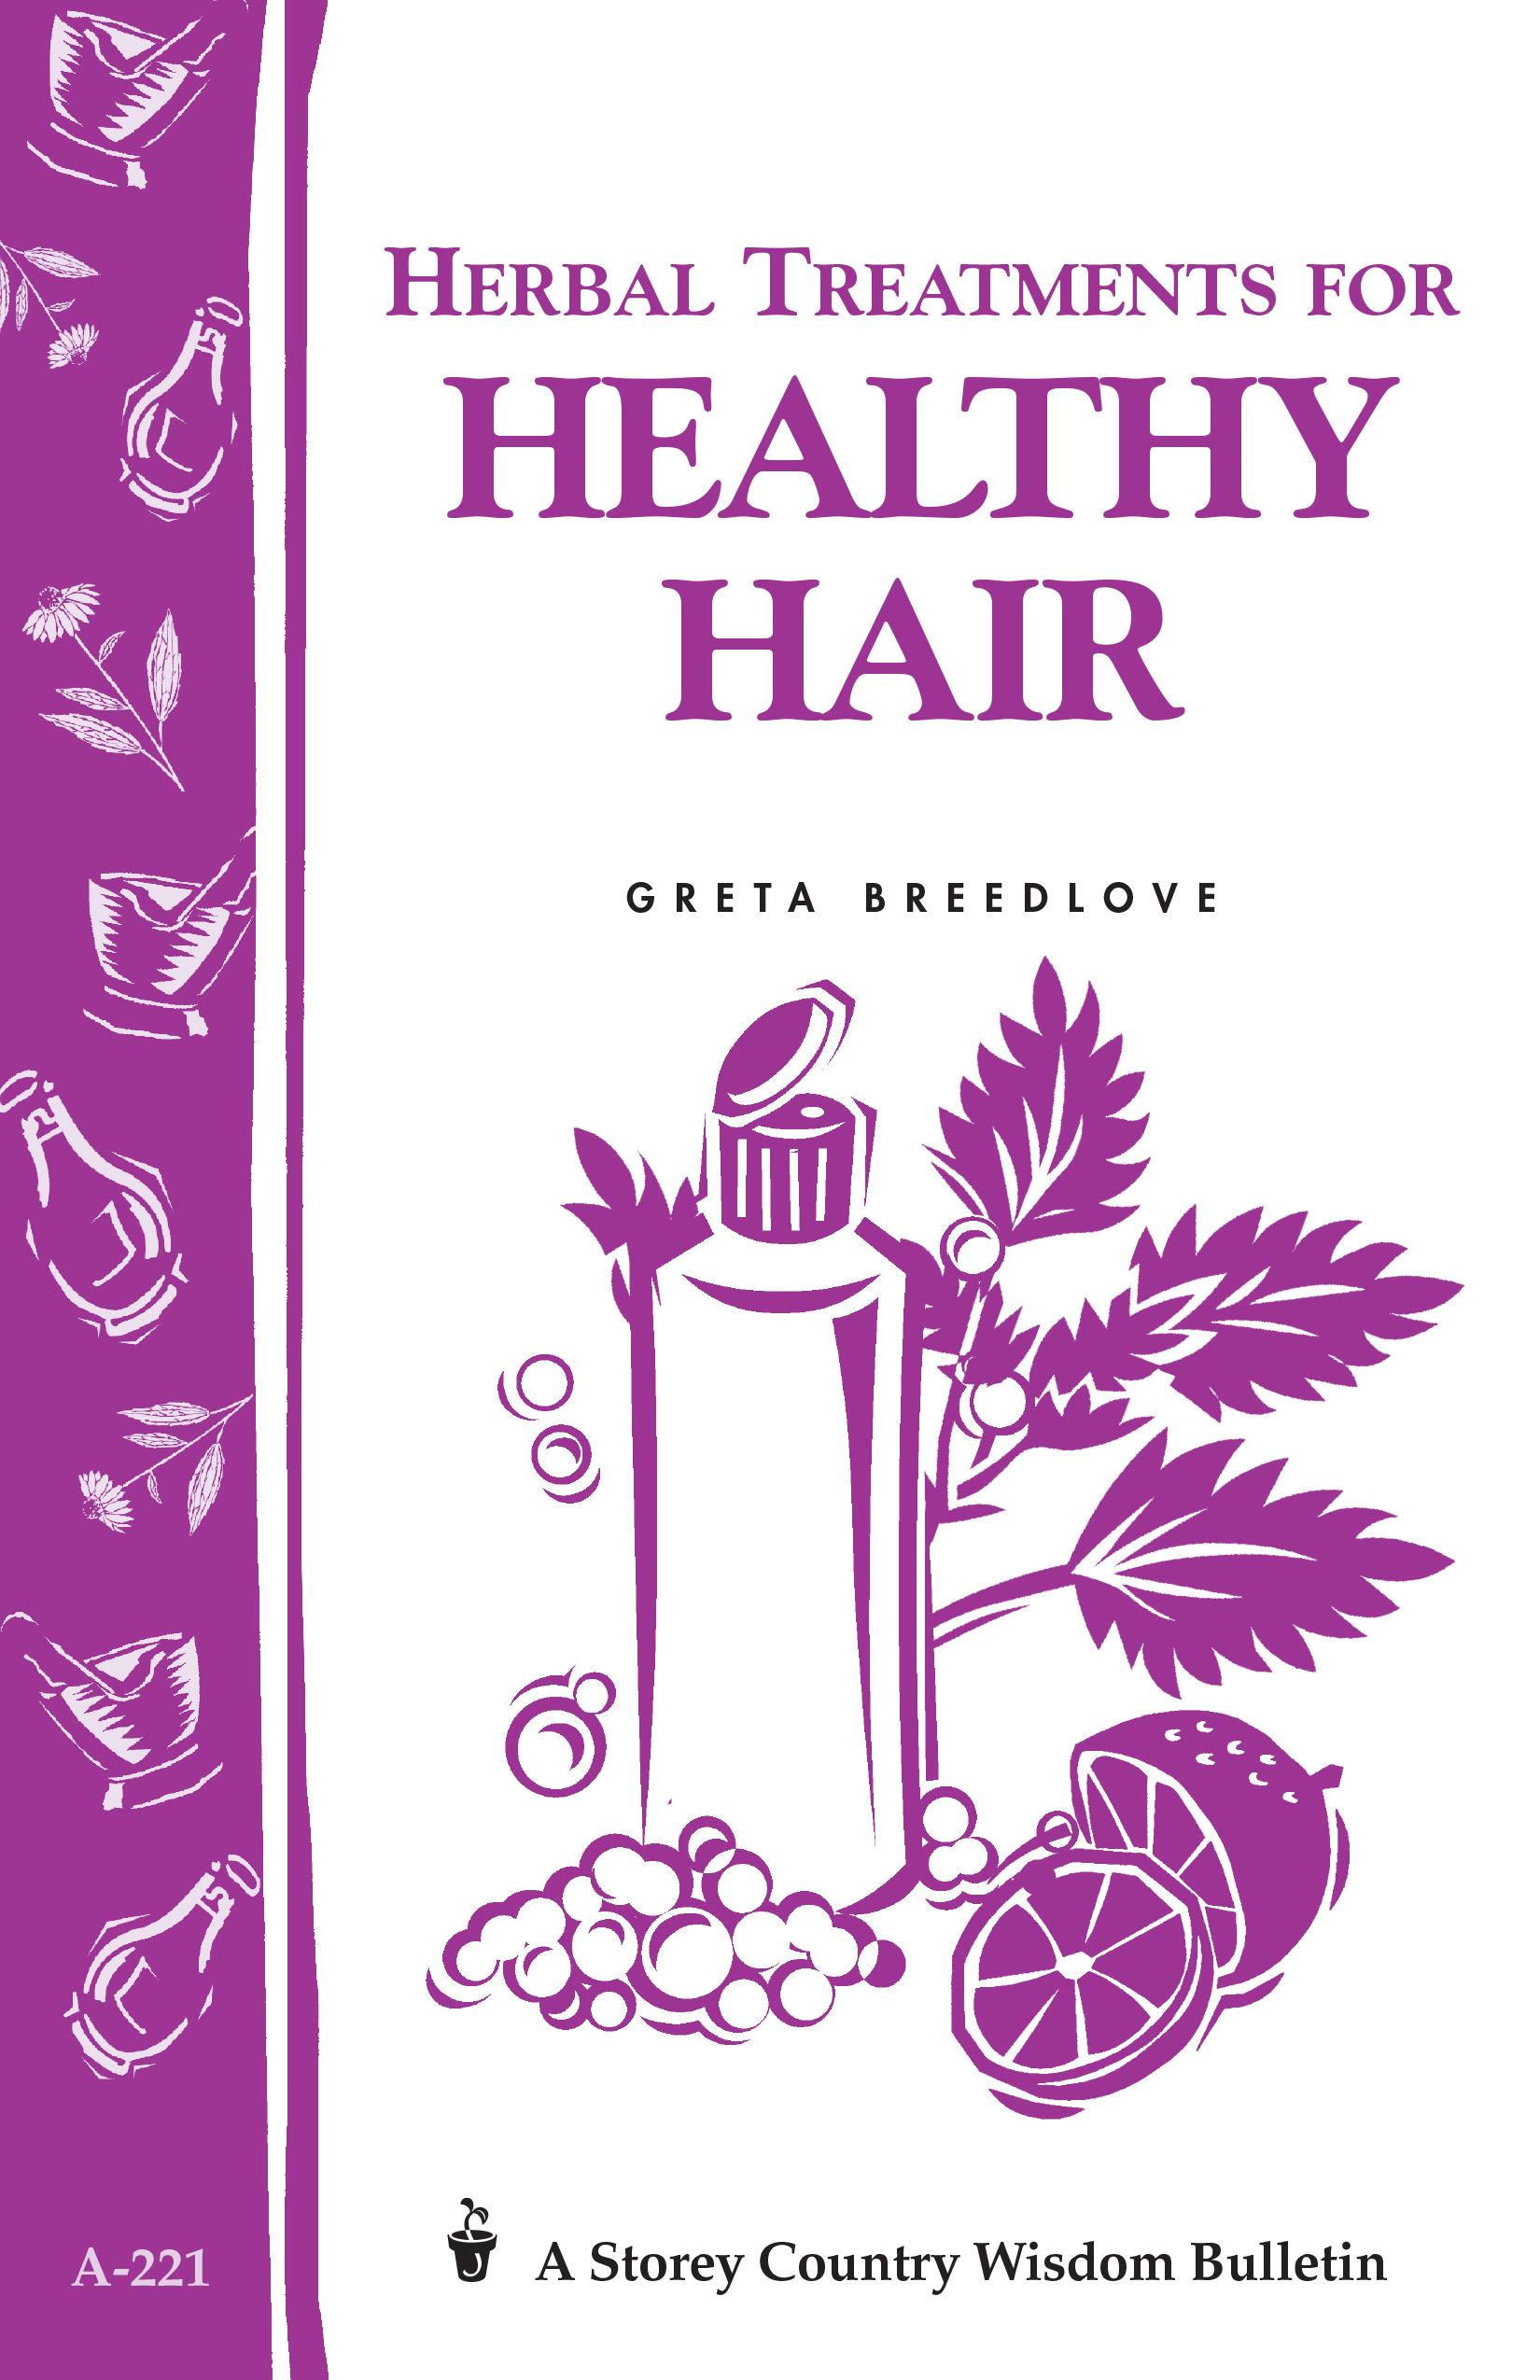 Herbal Treatments for Healthy Hair Storey Country Wisdom Bulletin A-221 - Greta Breedlove